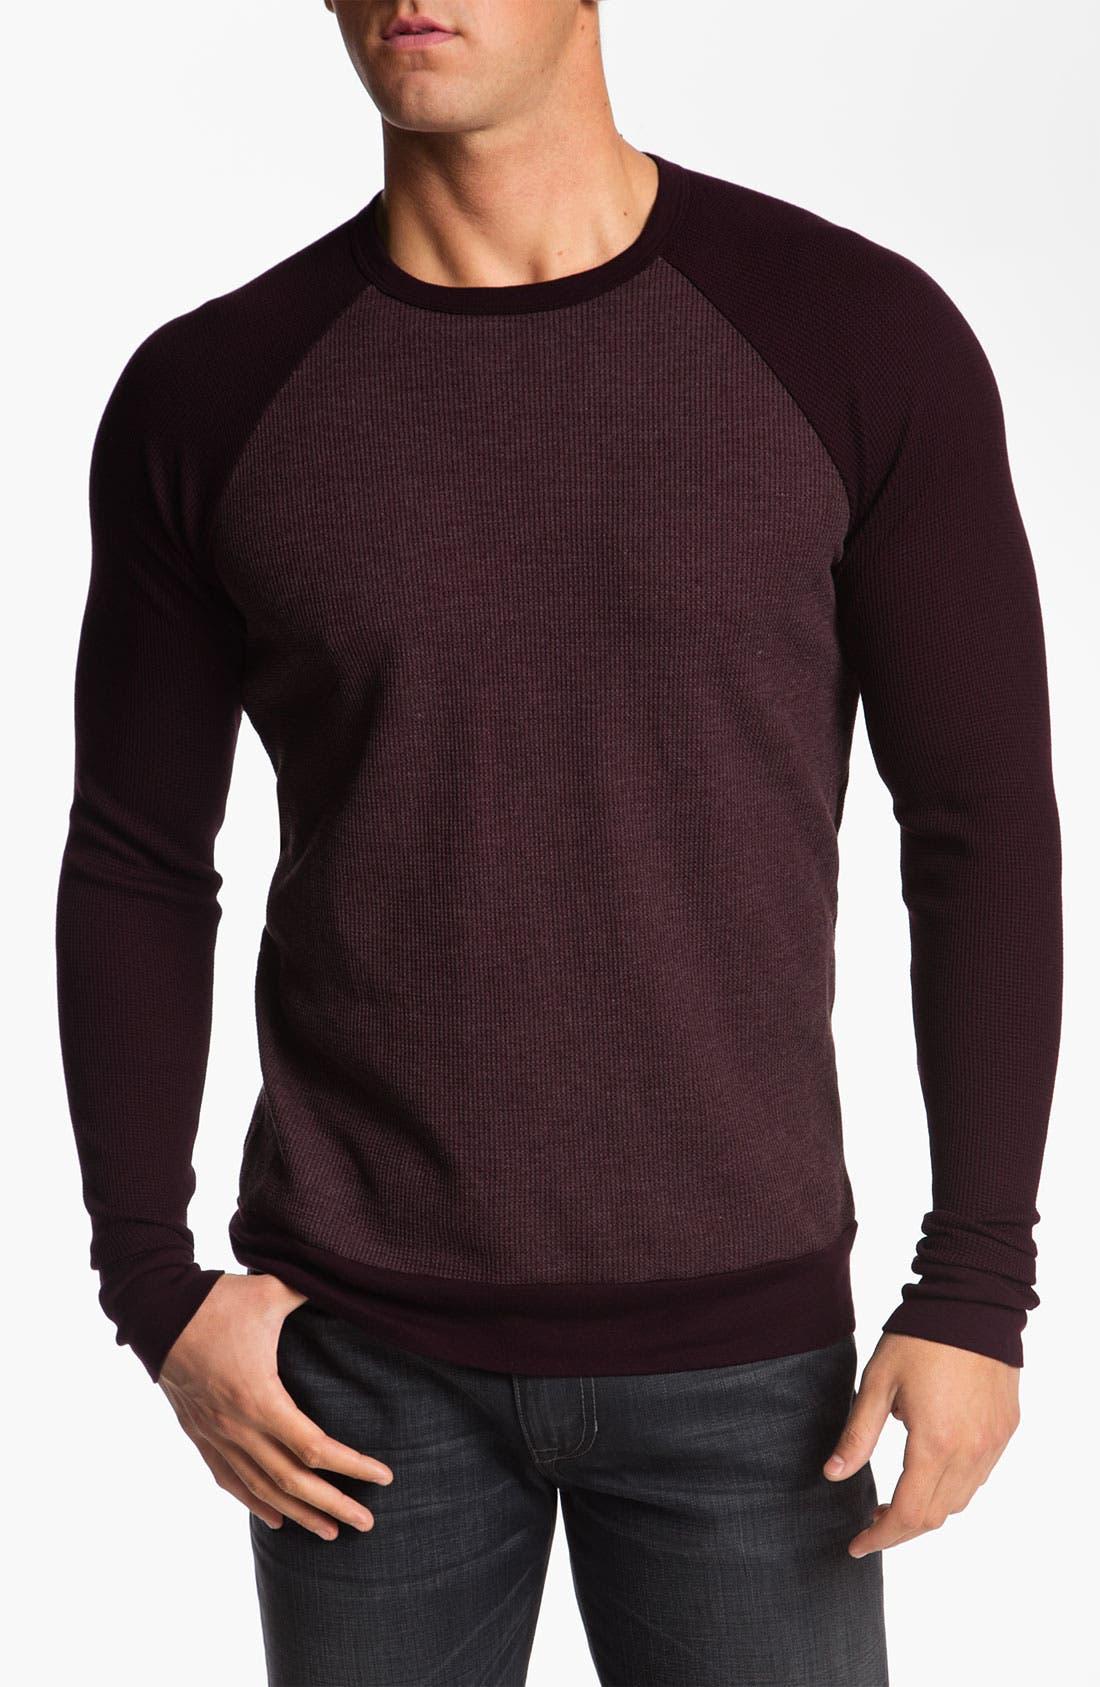 Alternate Image 1 Selected - Splendid Mills 'Slater' Raglan Sleeve Thermal Shirt